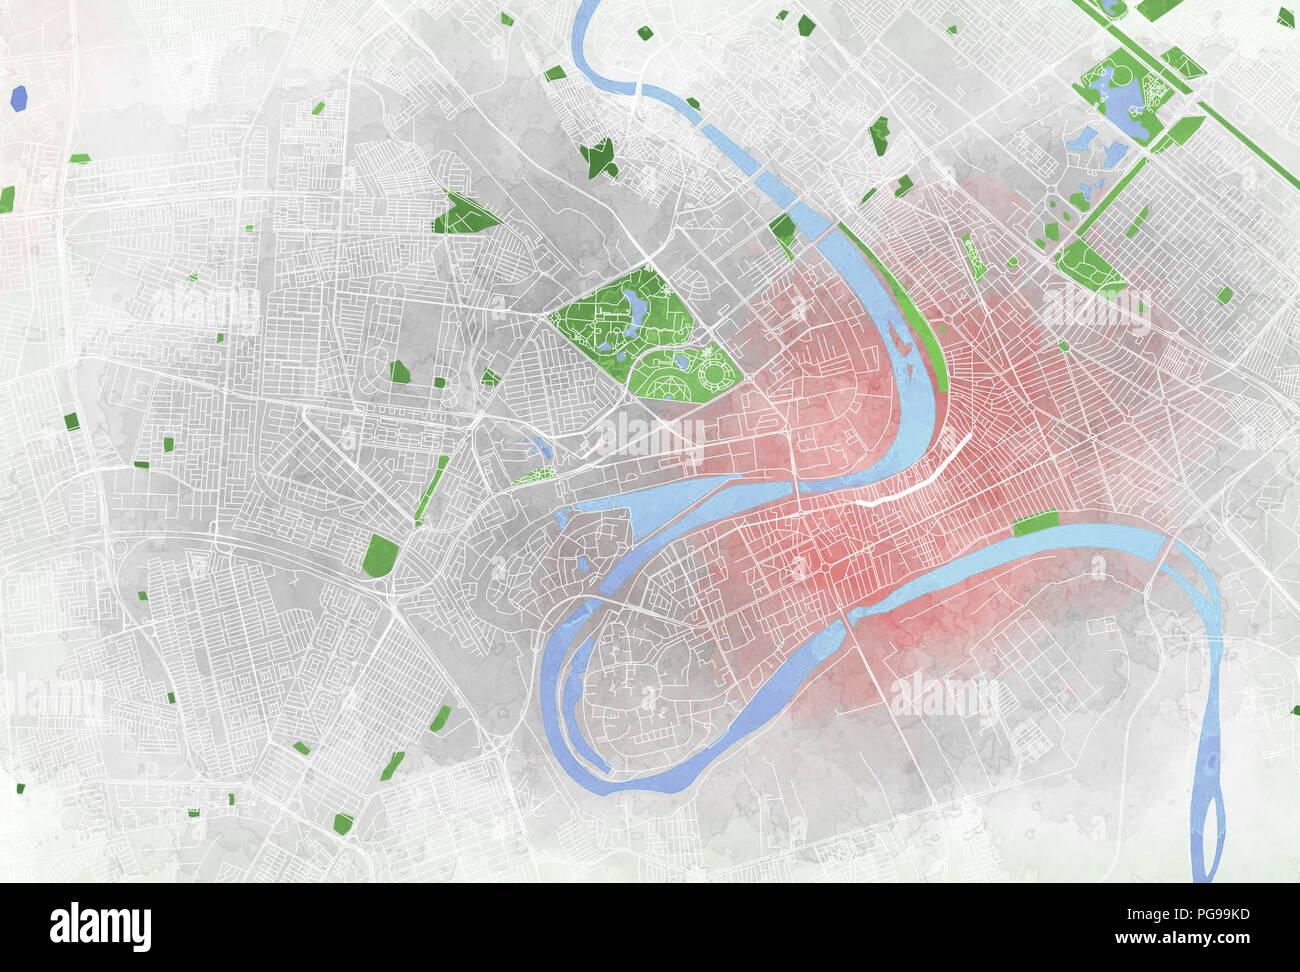 Satellite View Of Baghdad Map Stockfotos & Satellite View Of Baghdad ...